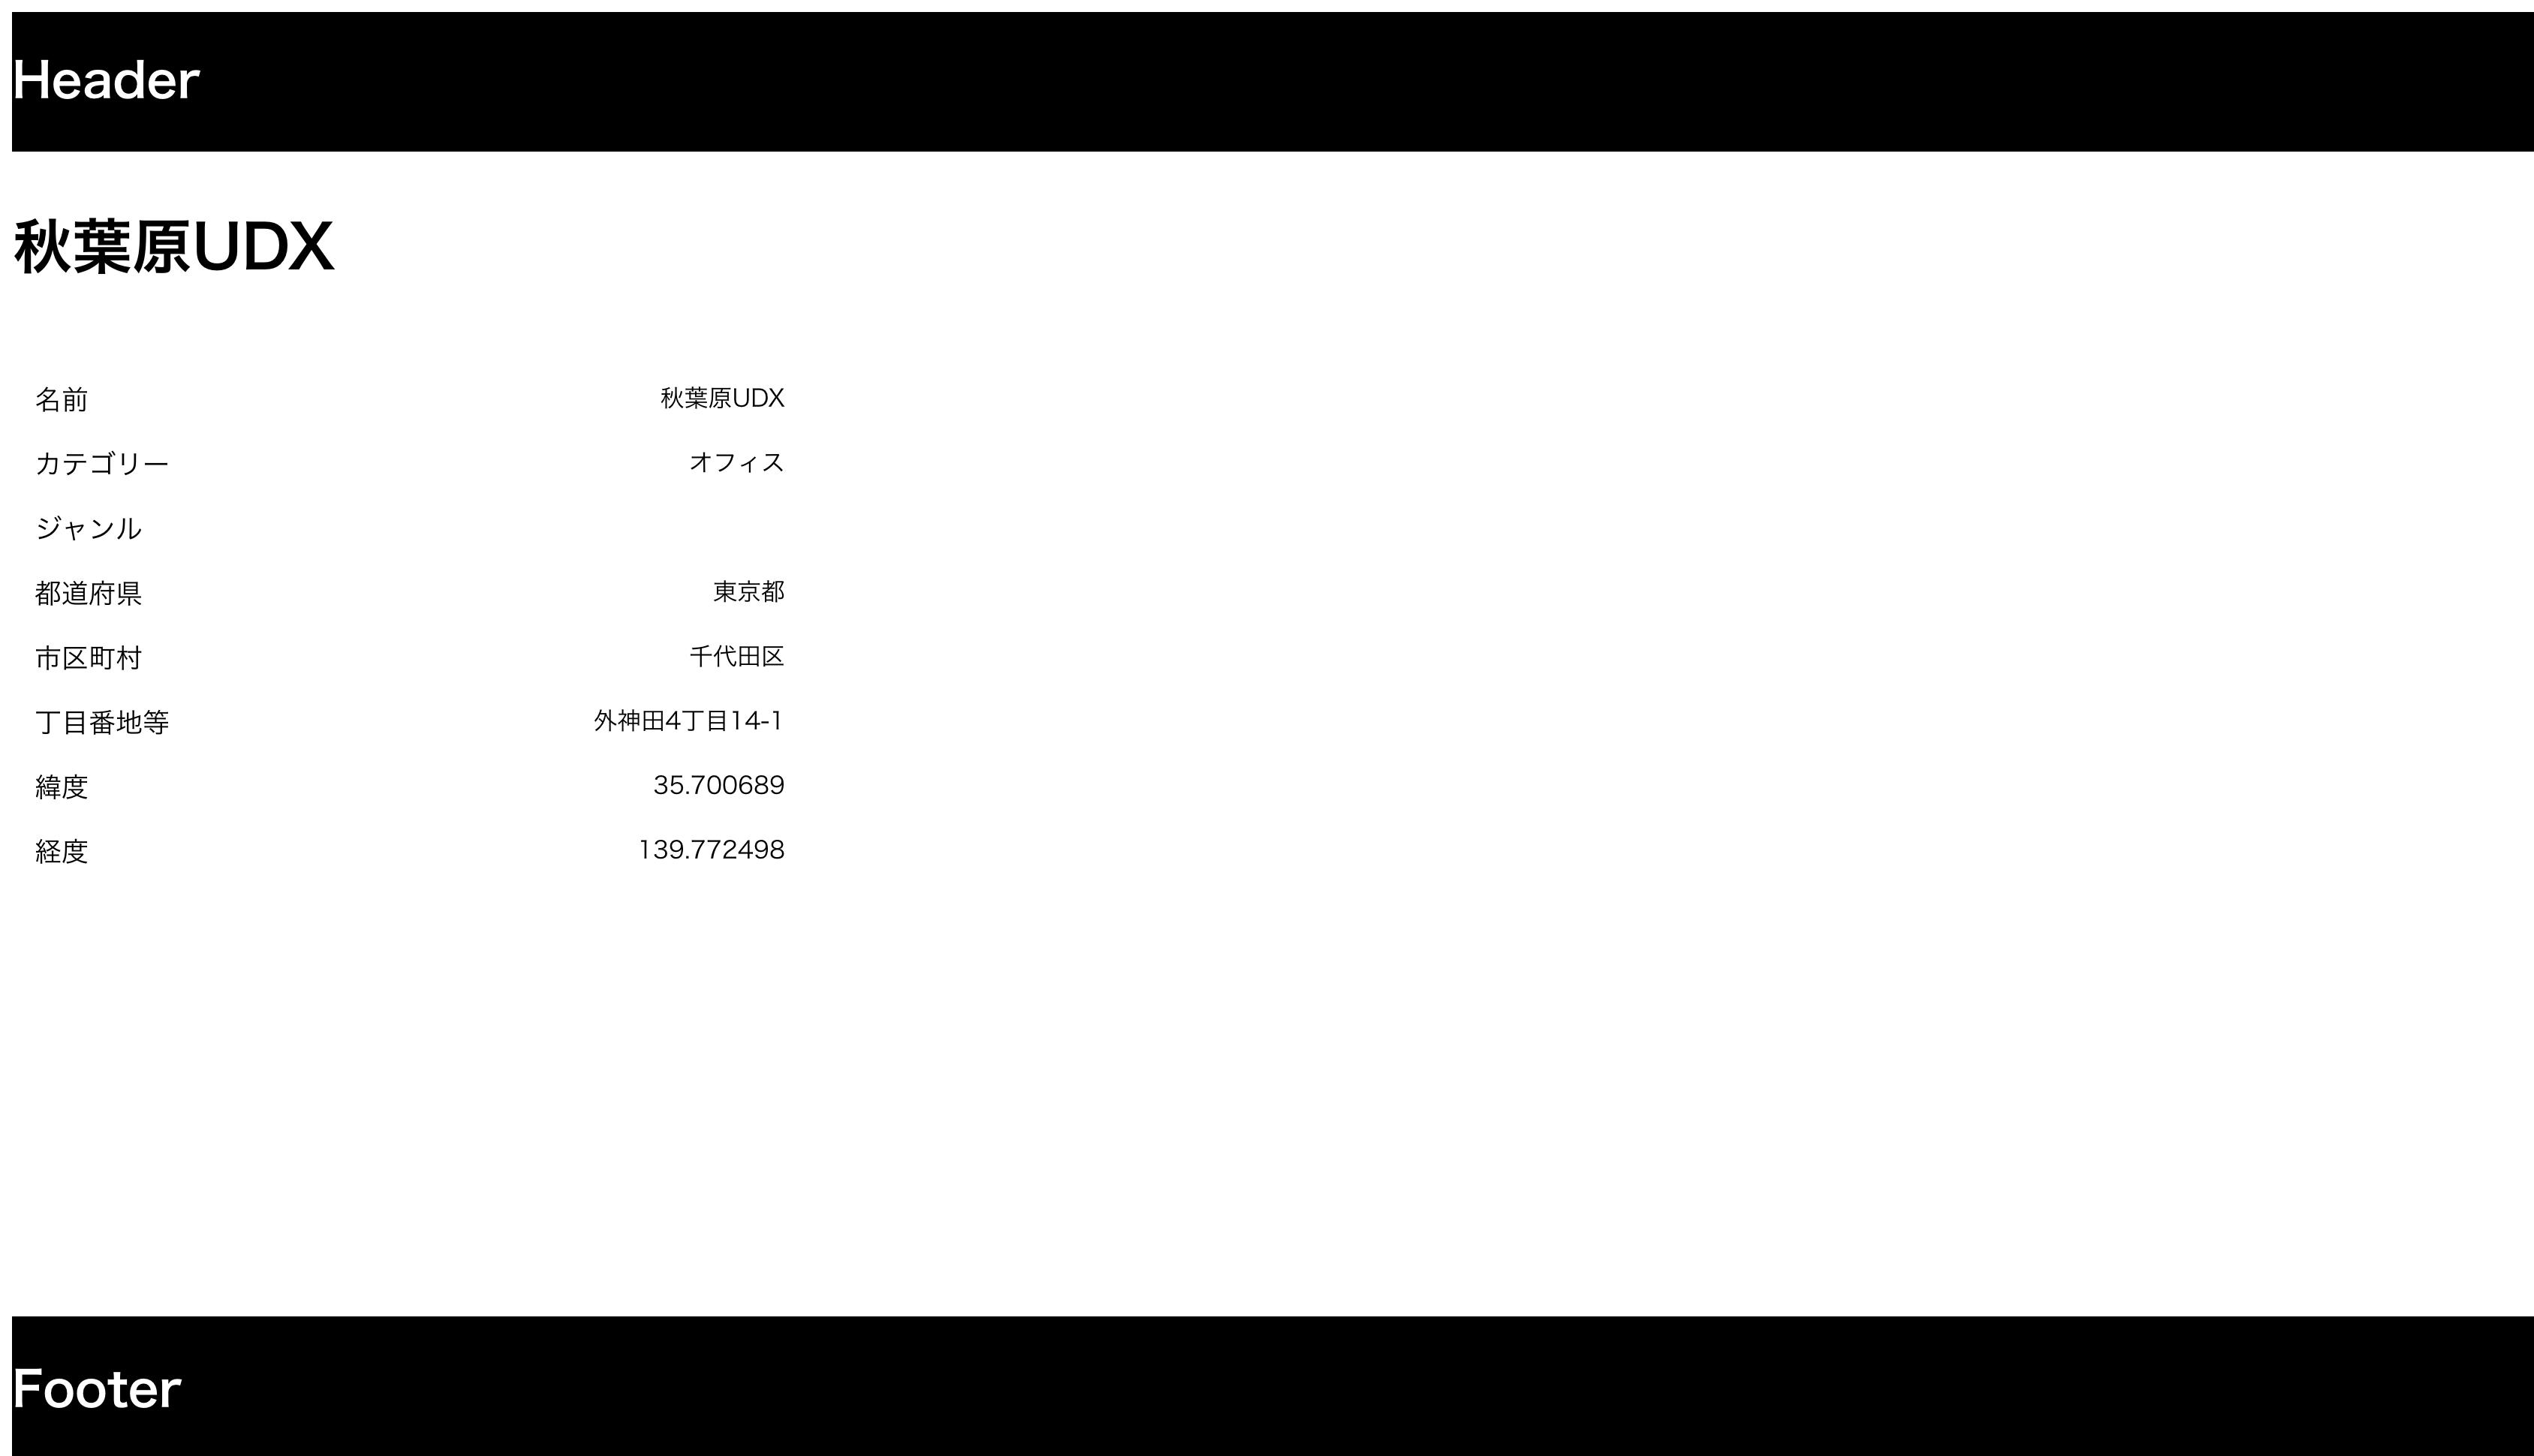 Vue js + Django REST framework - Qiita